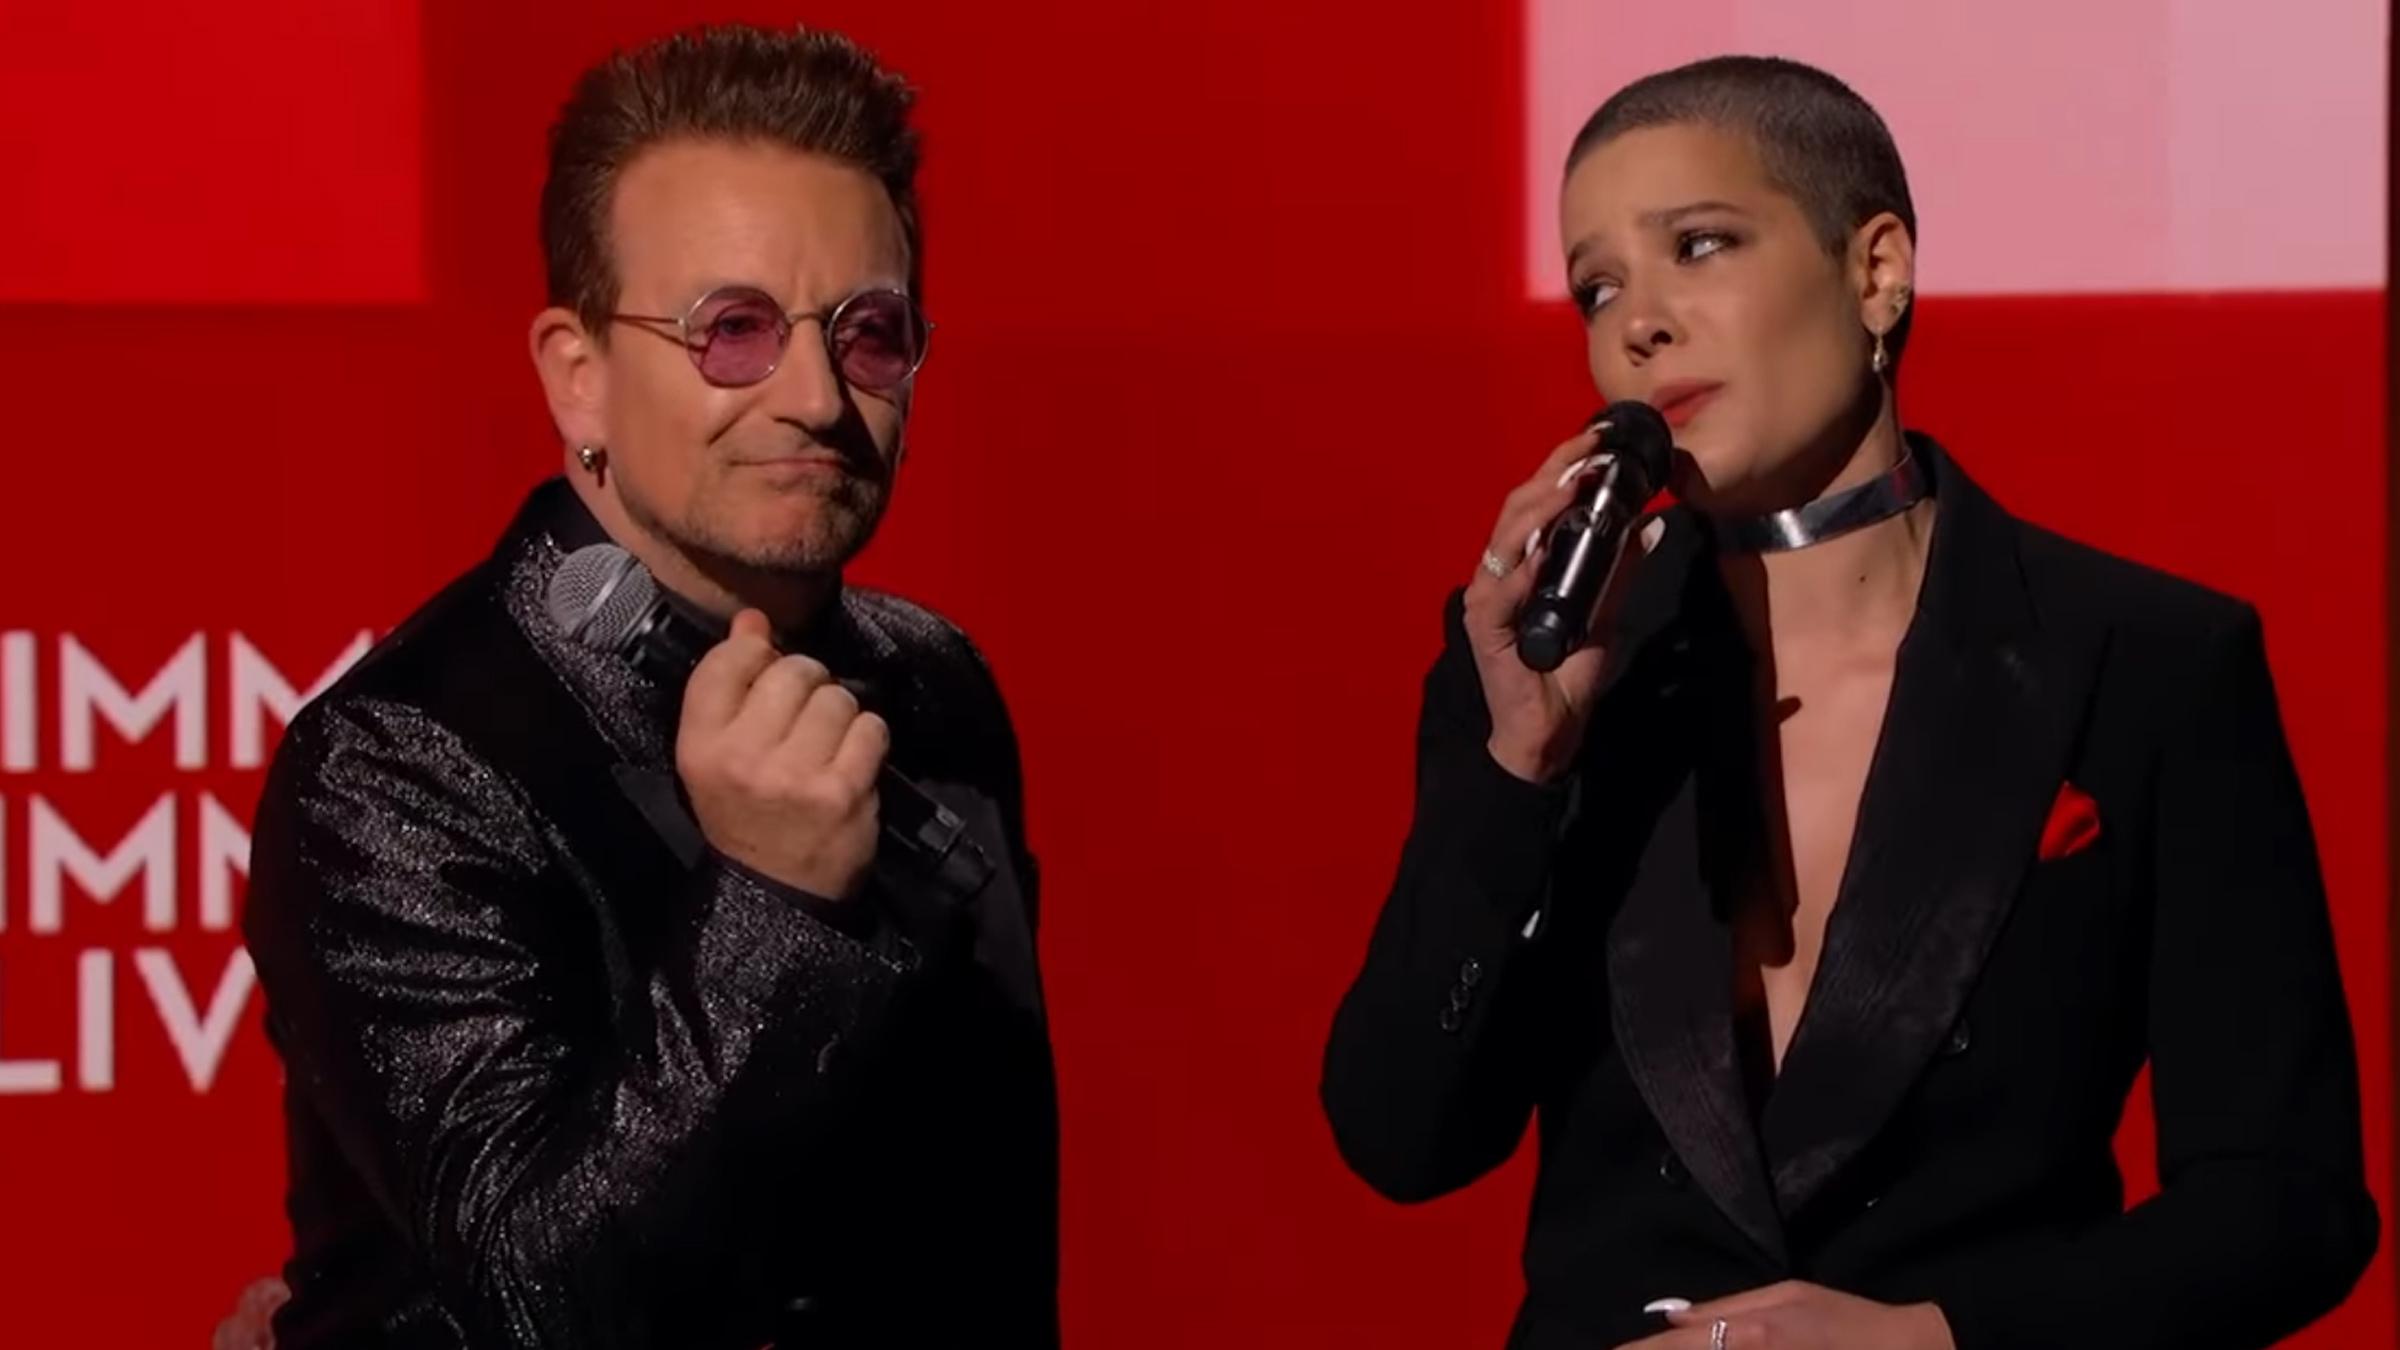 Bono halsey teaser